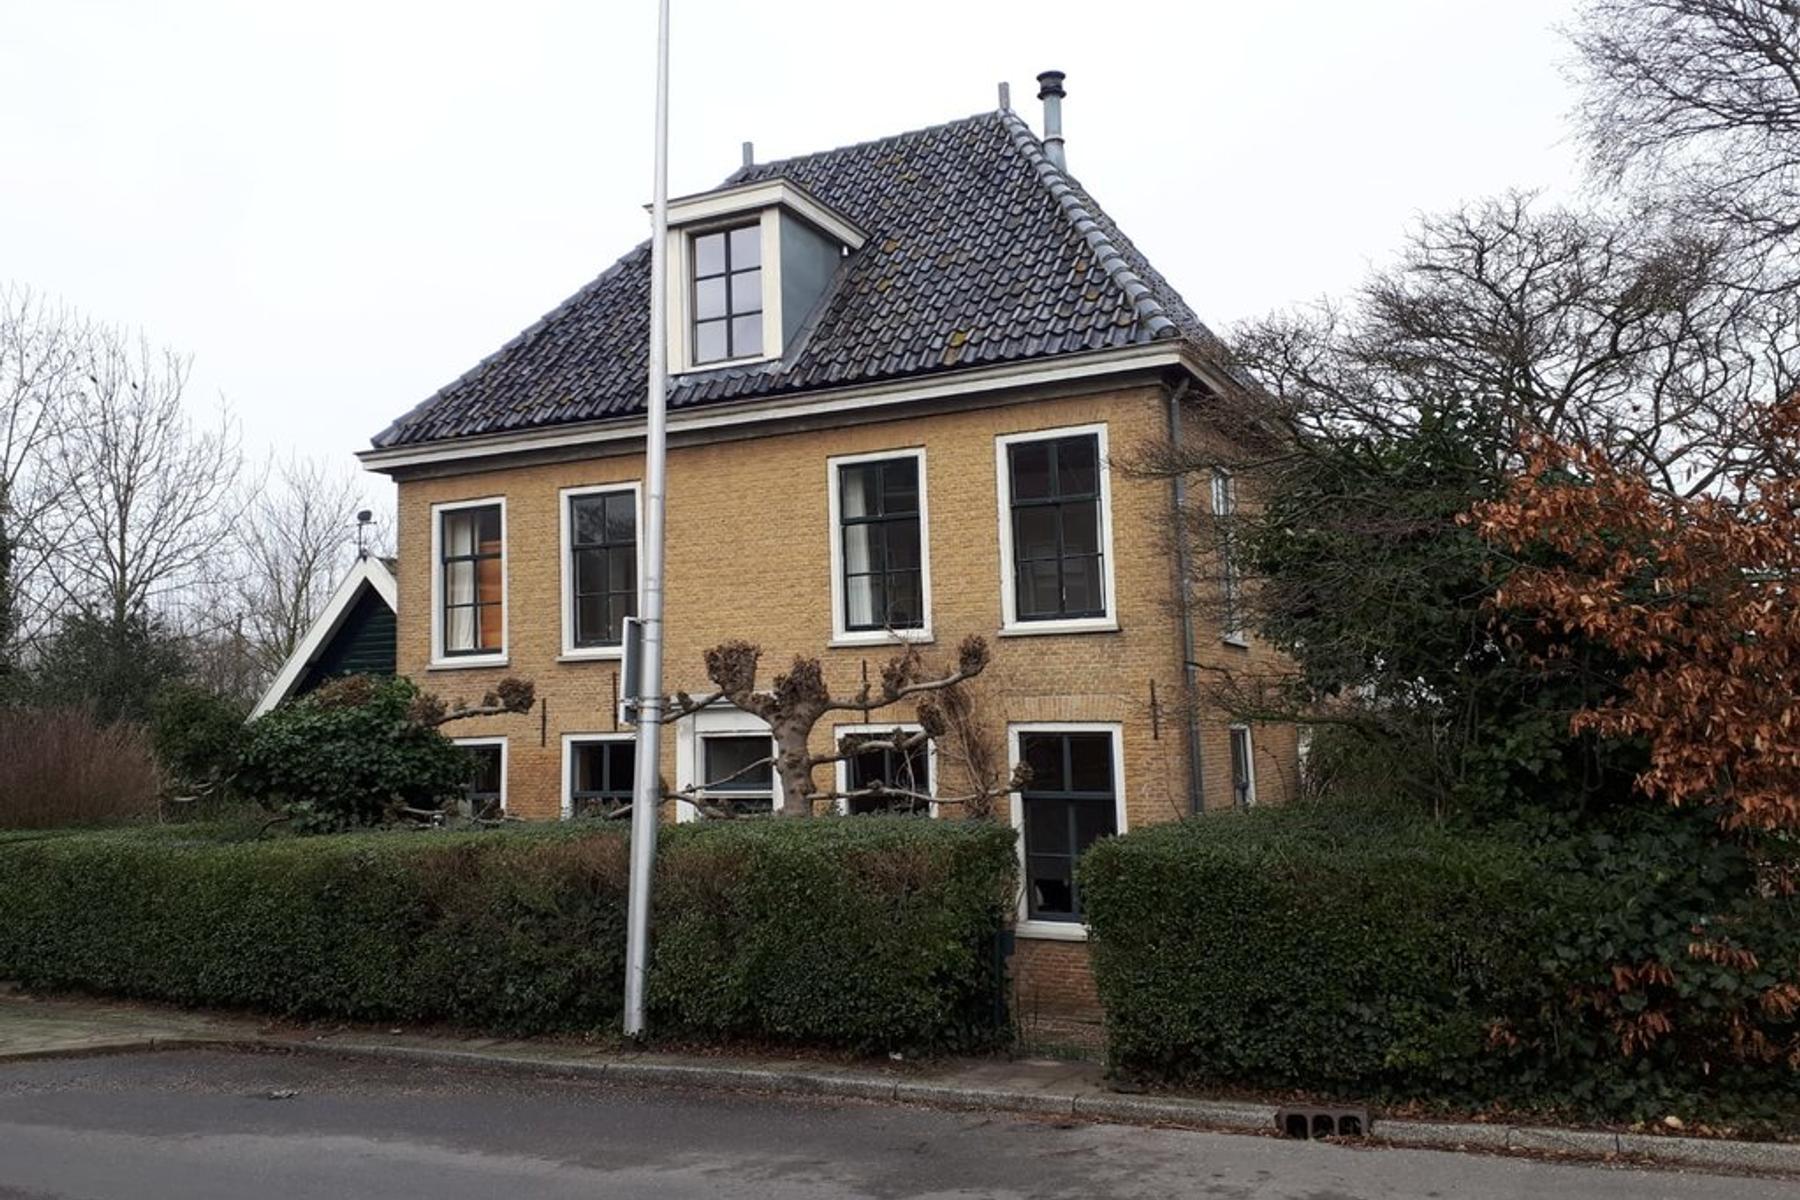 Lindenhovestraat 2 A in Zwammerdam 2471 XK